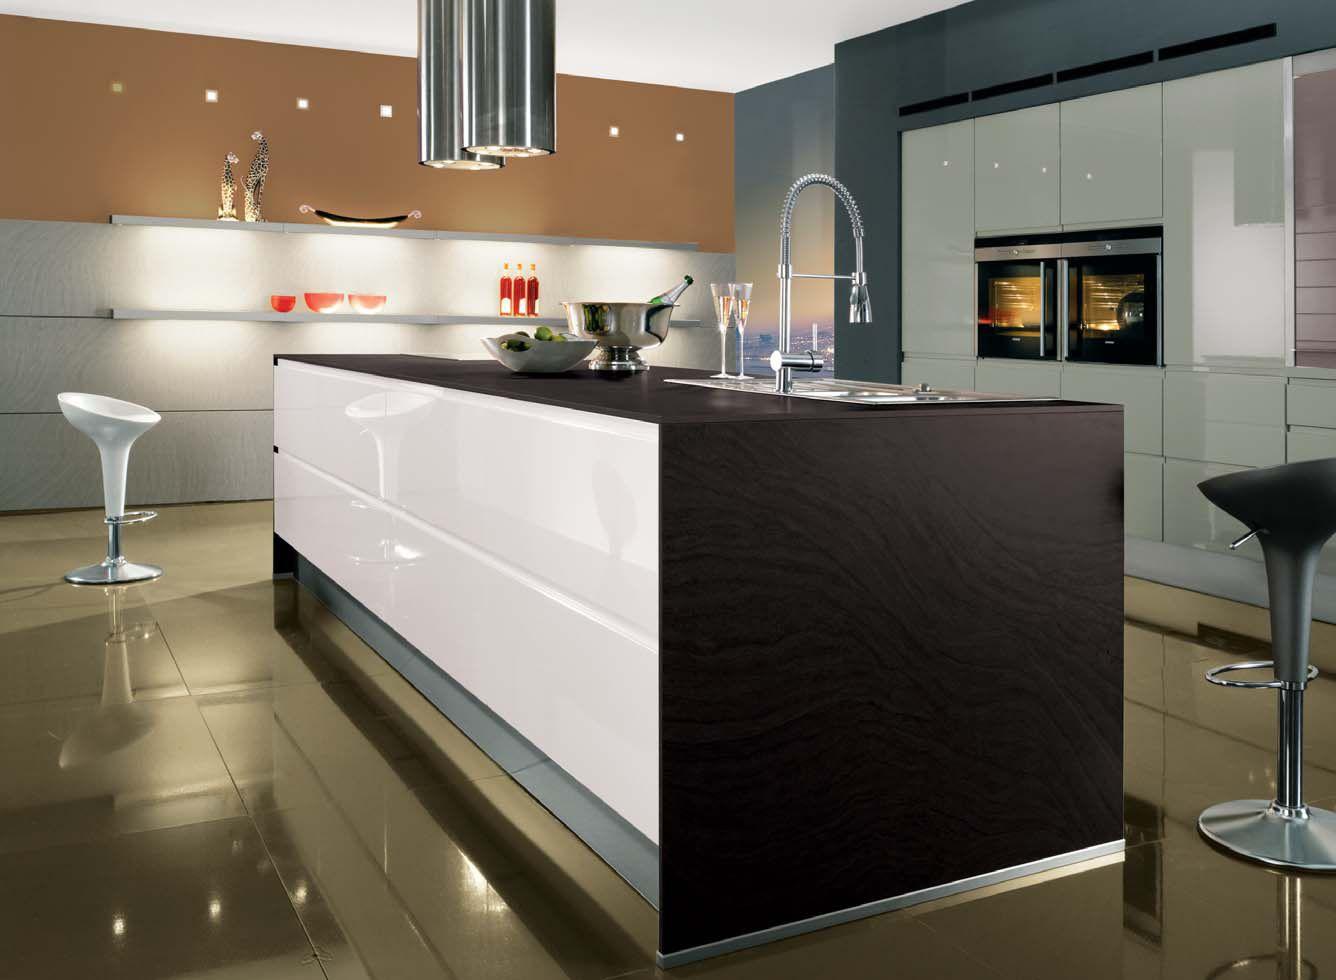 Cocina 77 cocinas capis dise o y fabricaci n de cocinas for Configurador de cocinas